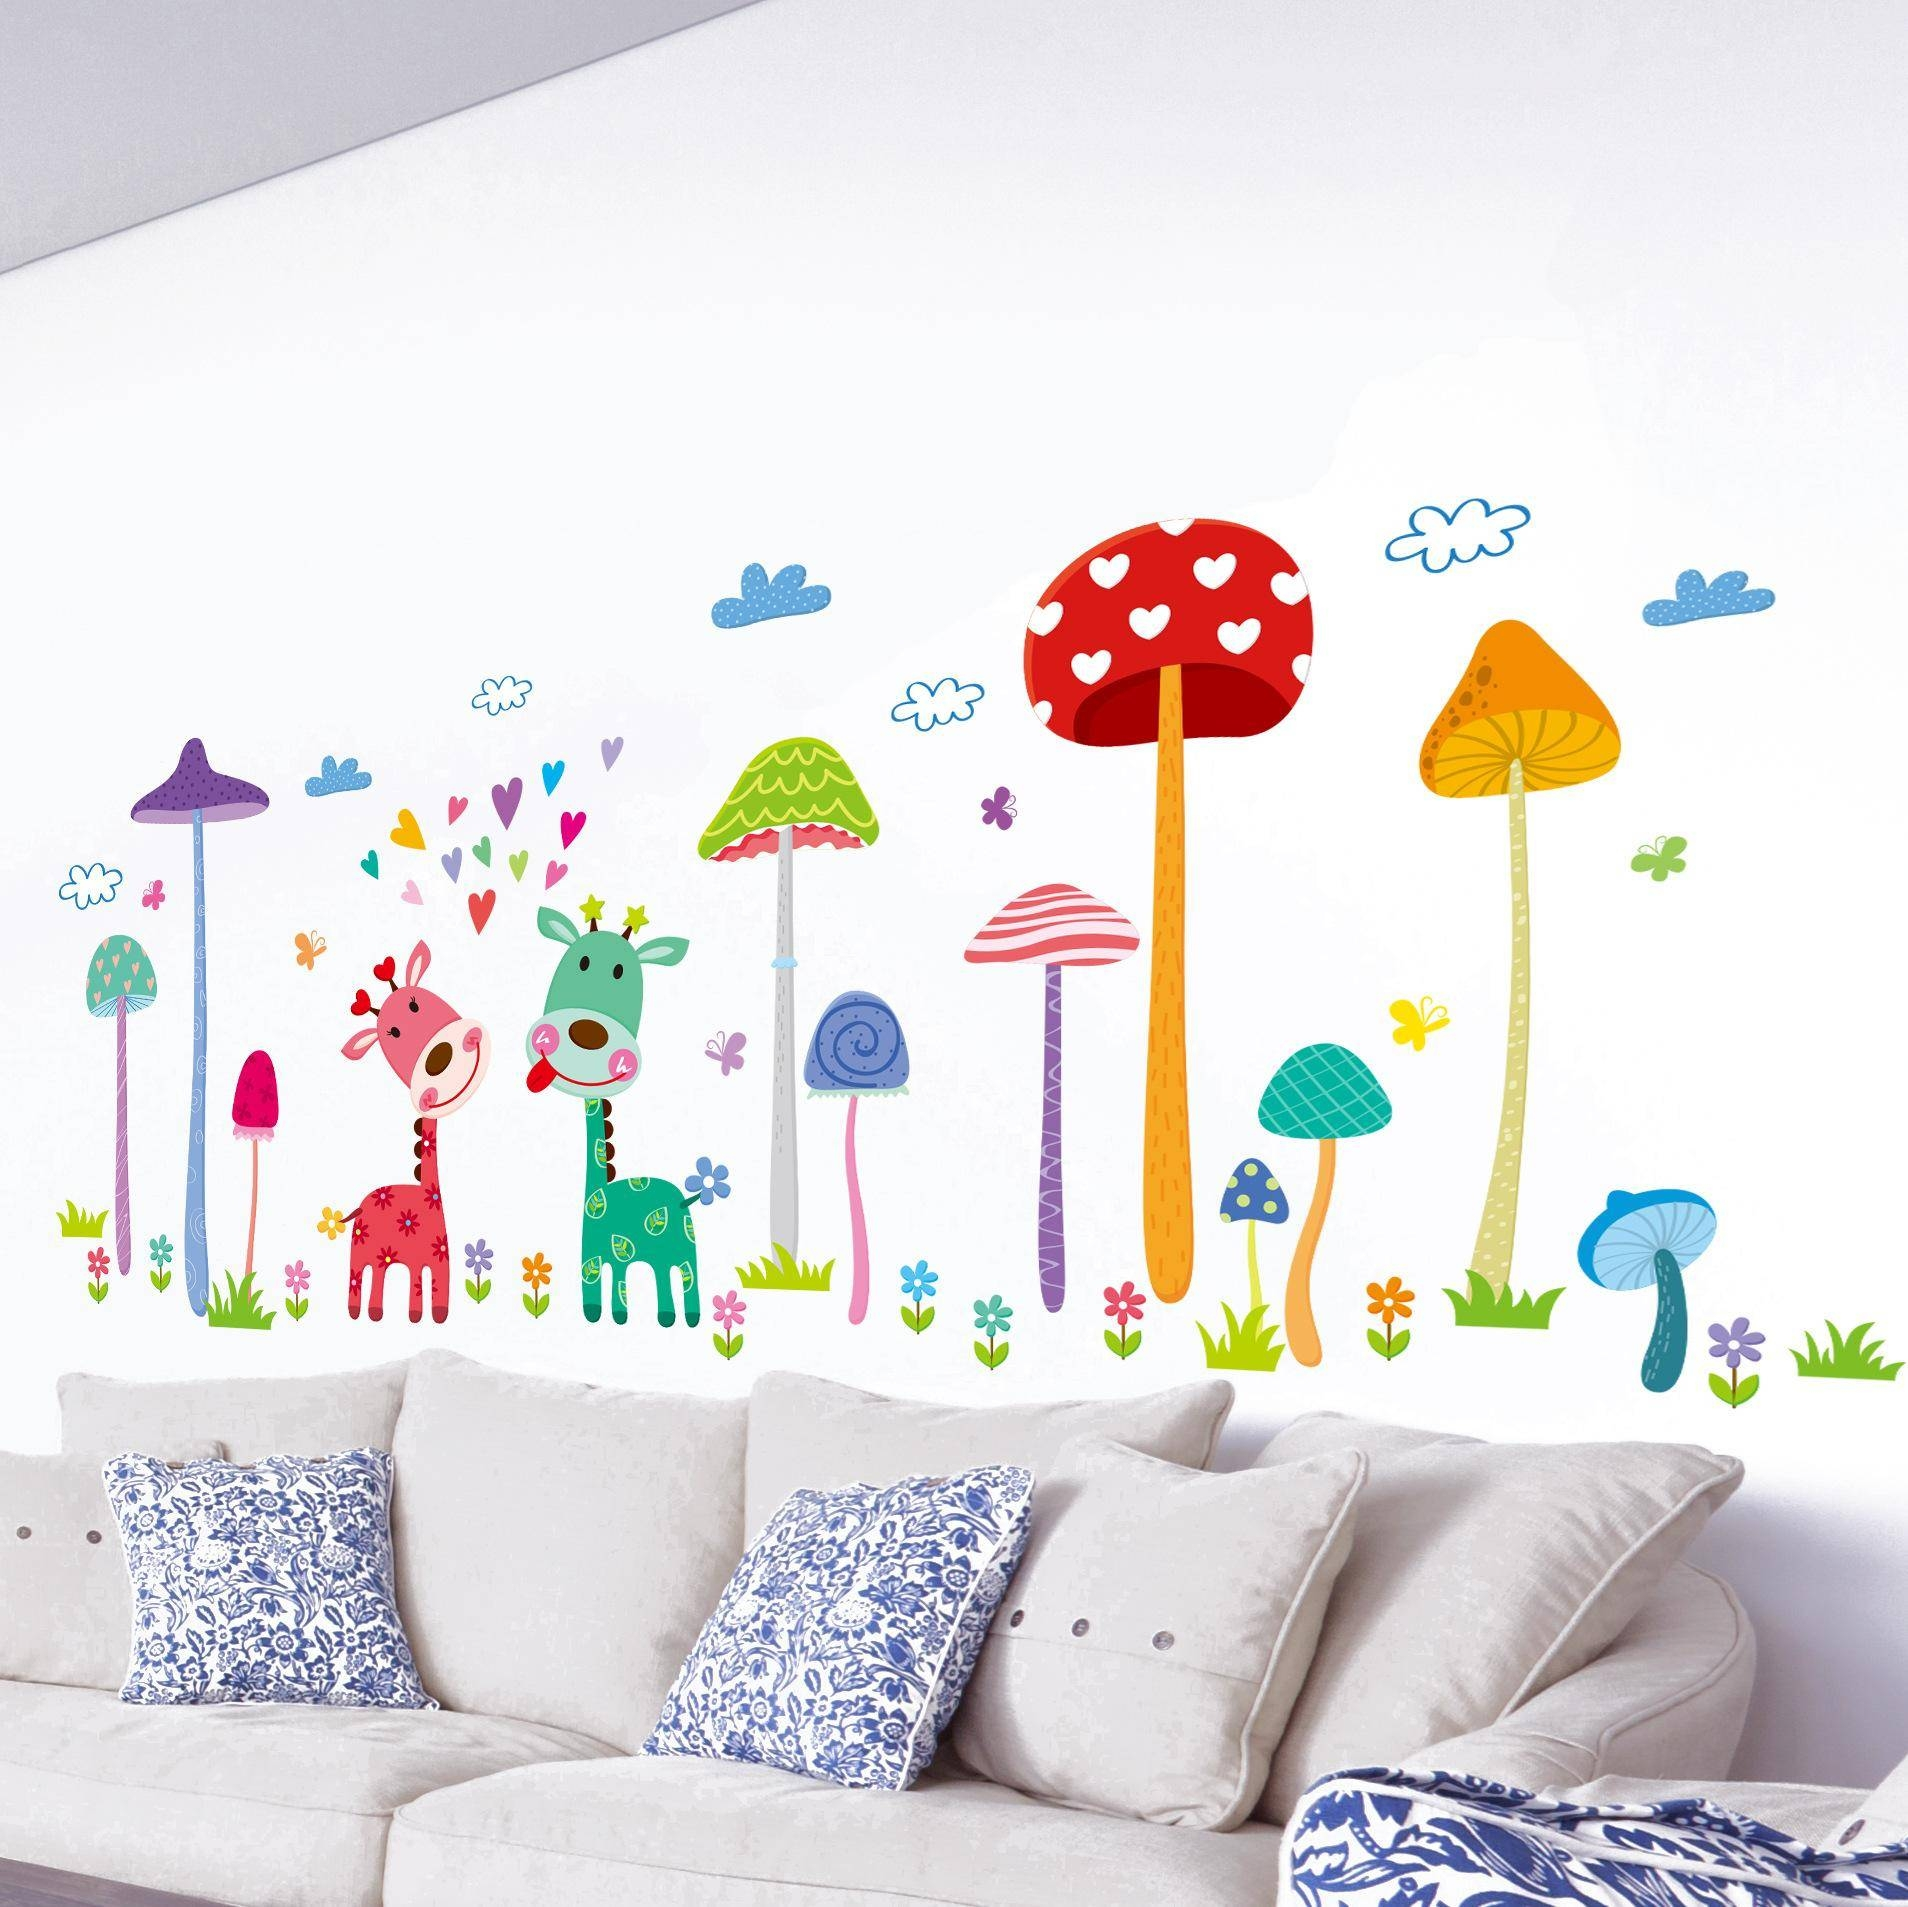 Forest Mushroom Deer Home Wall Art Mural Decor Kids Babies Room Within 2018 Children Wall Art (View 14 of 15)